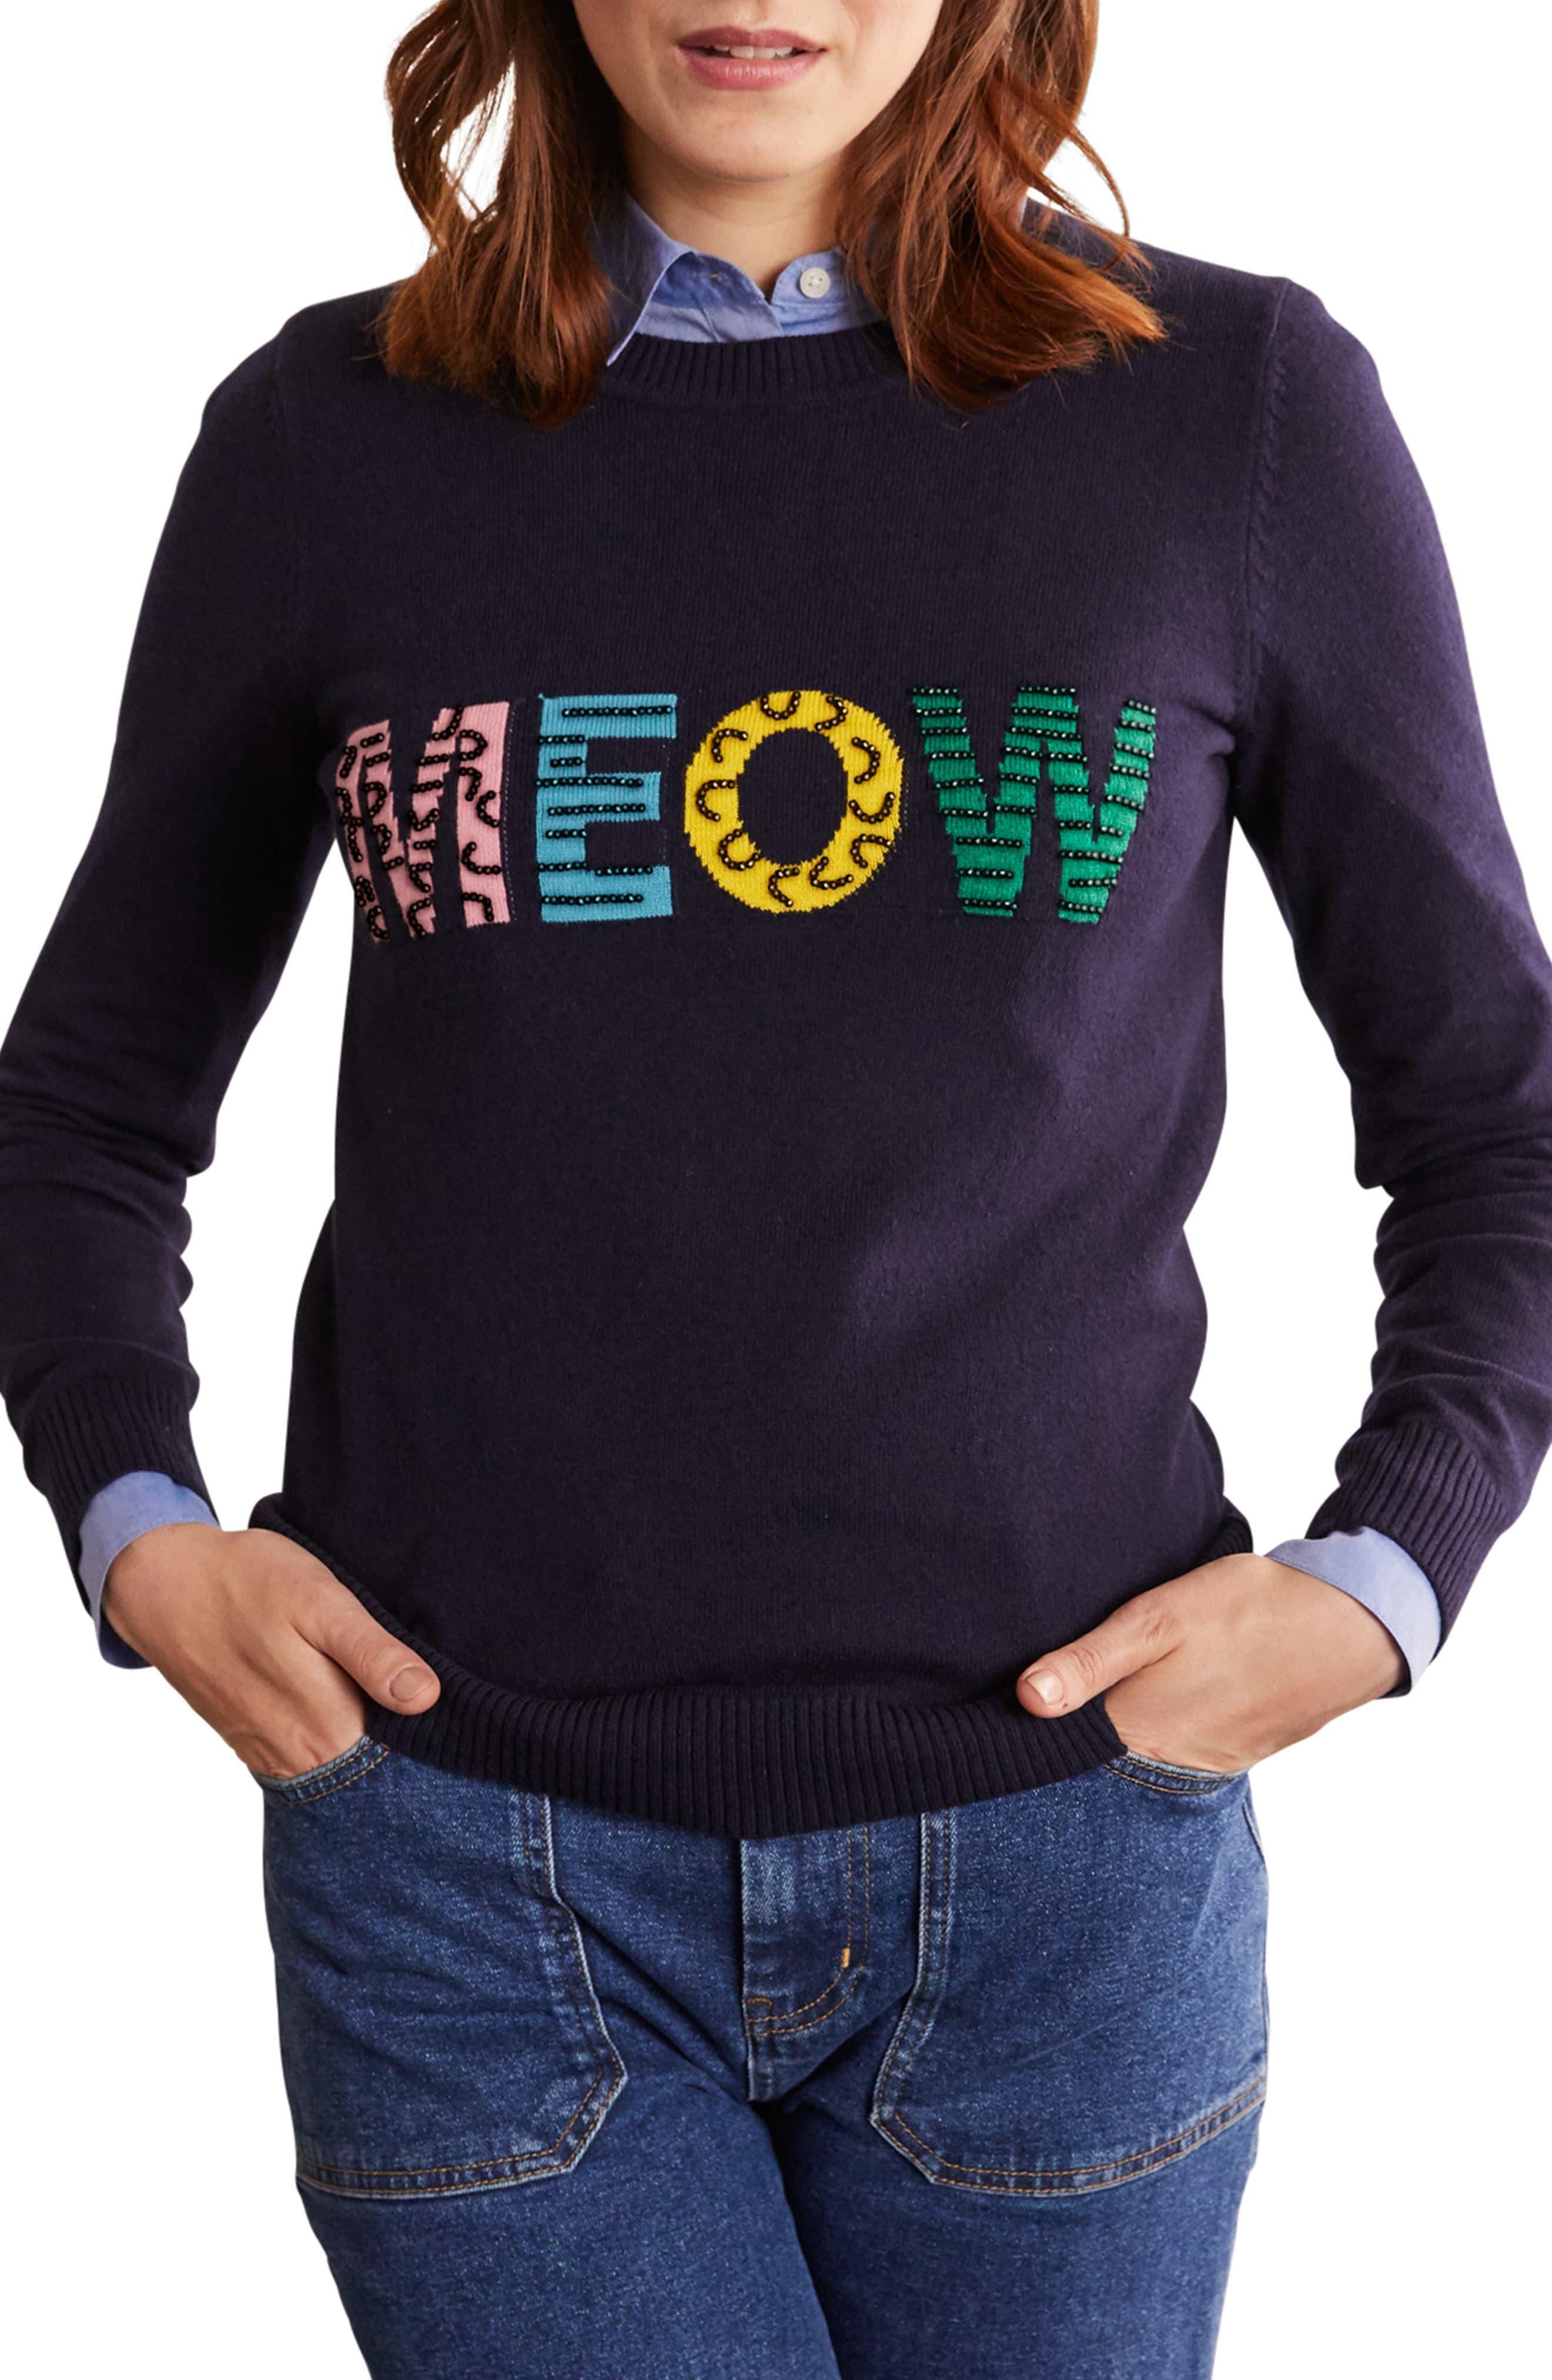 NAVY RED STAR Joules Monty Printed Crew Neck Sweatshirt